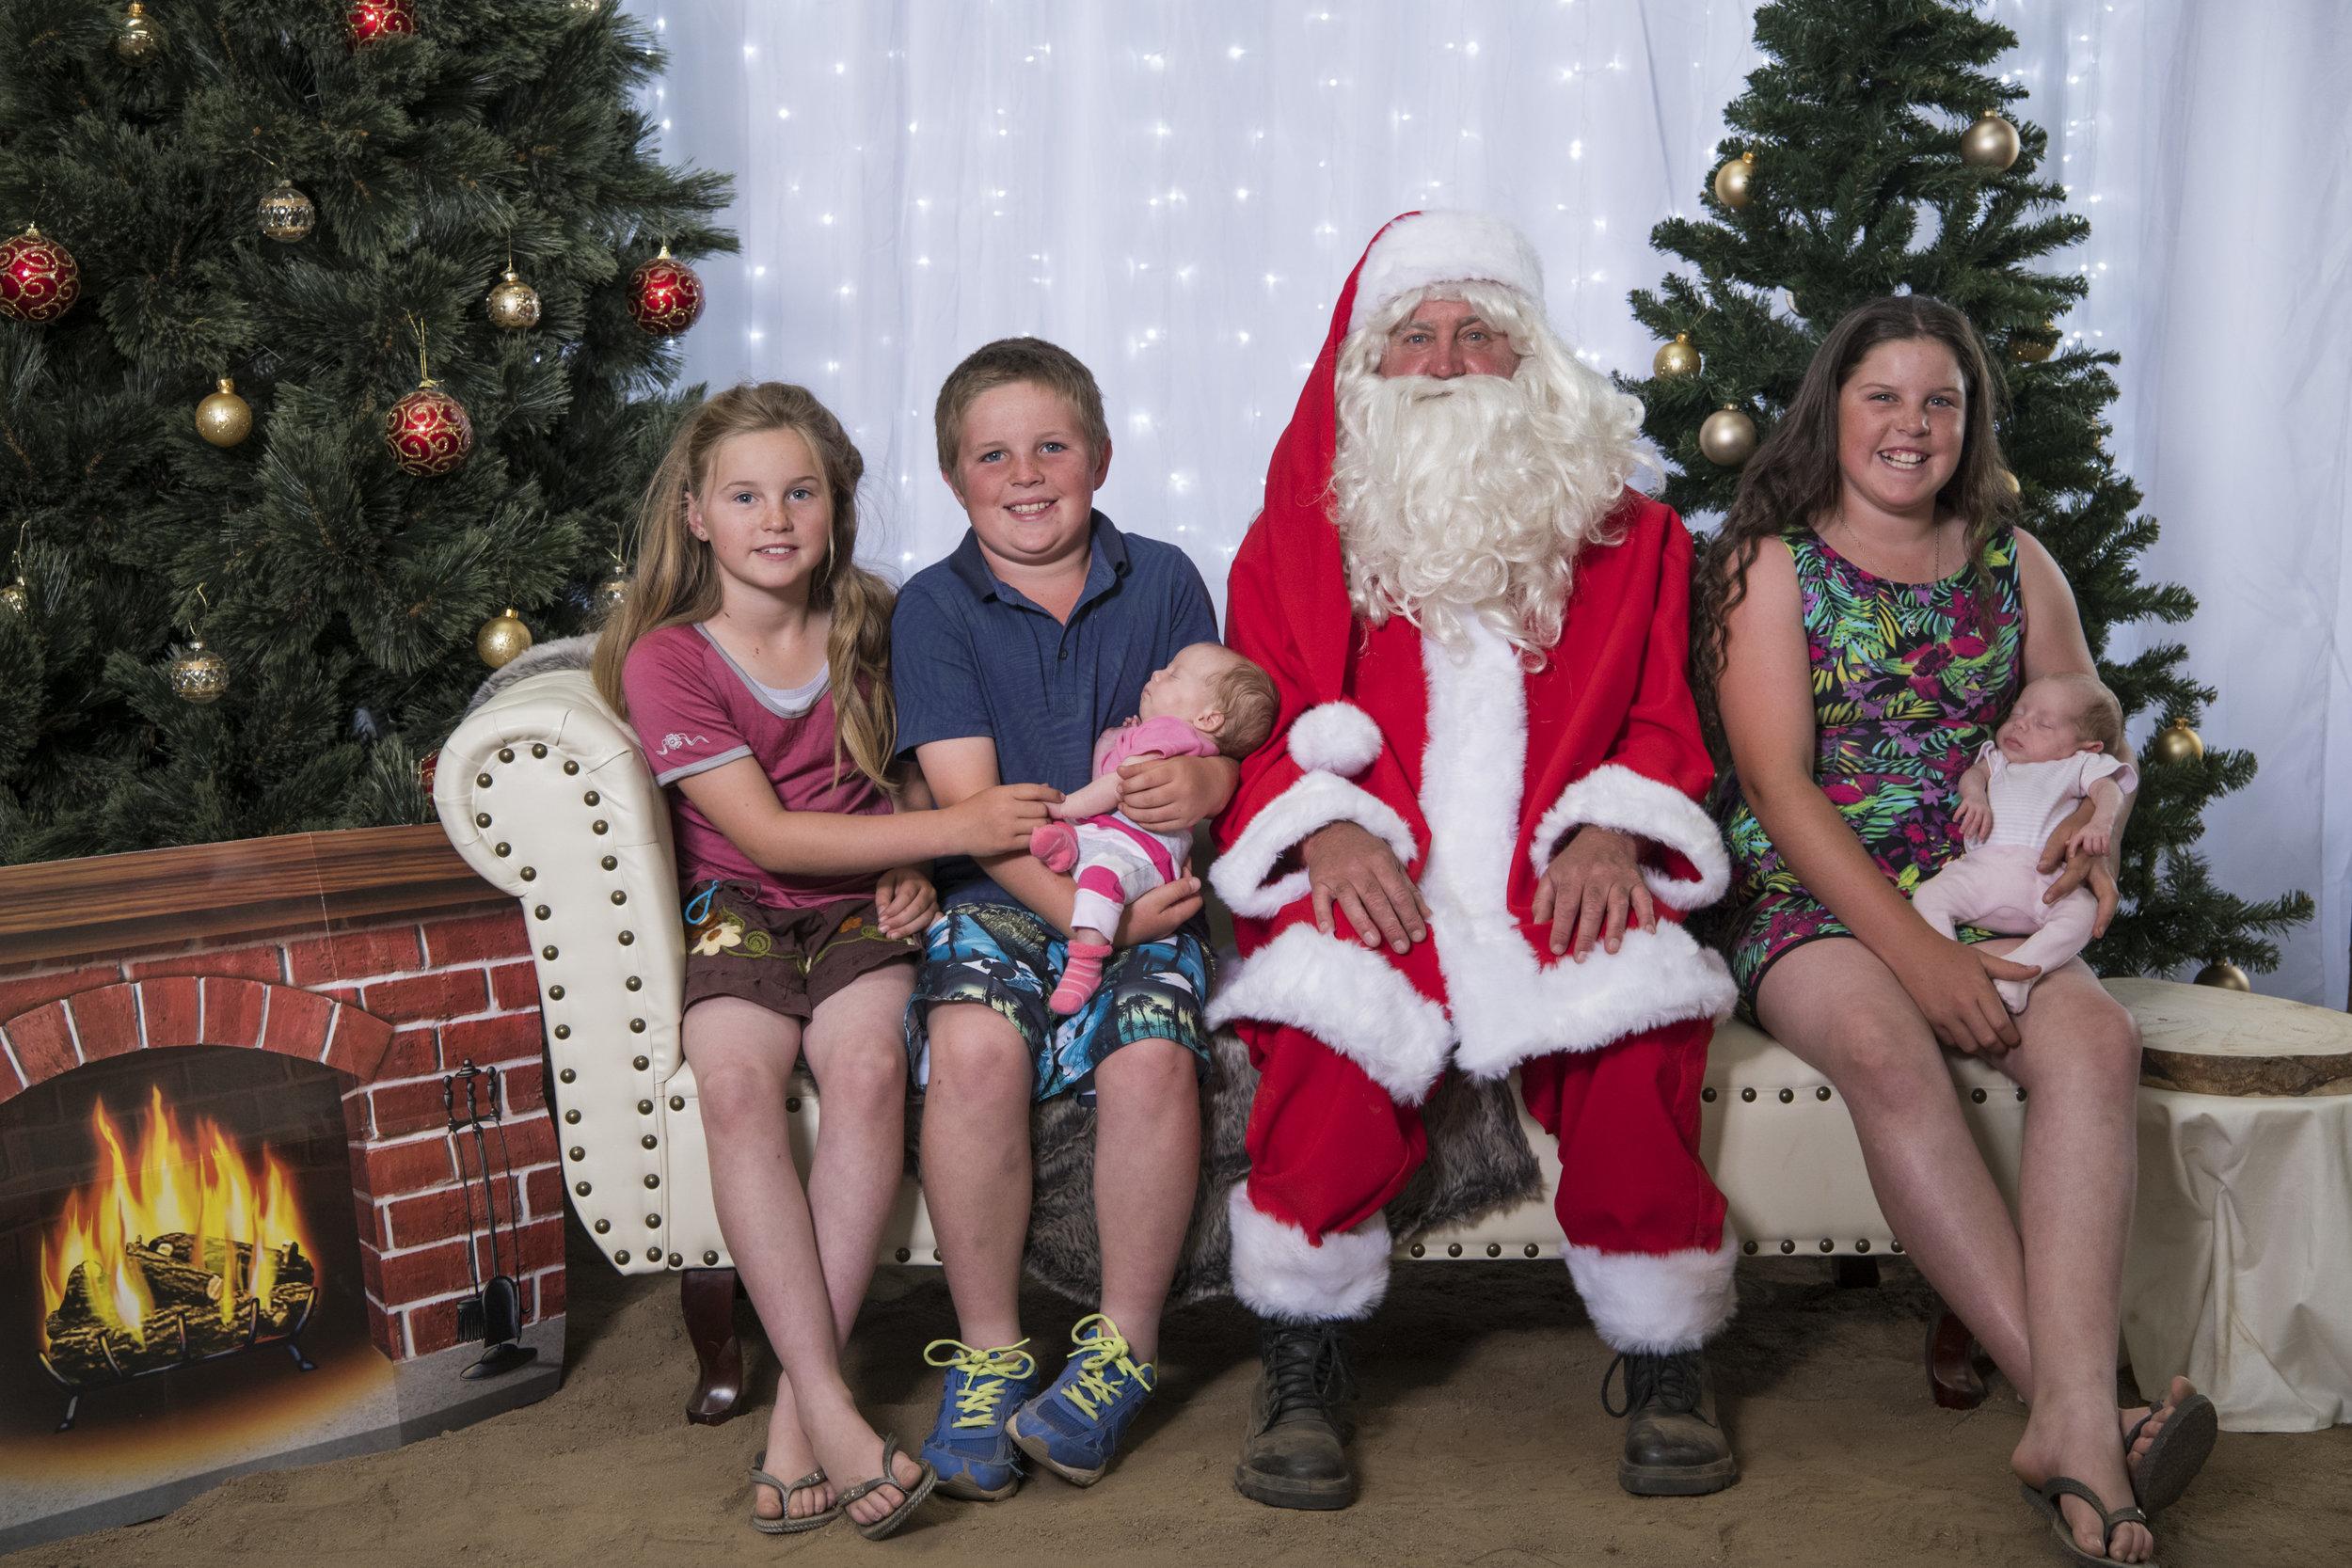 Classic country community Christmas Photo - Dec 2017